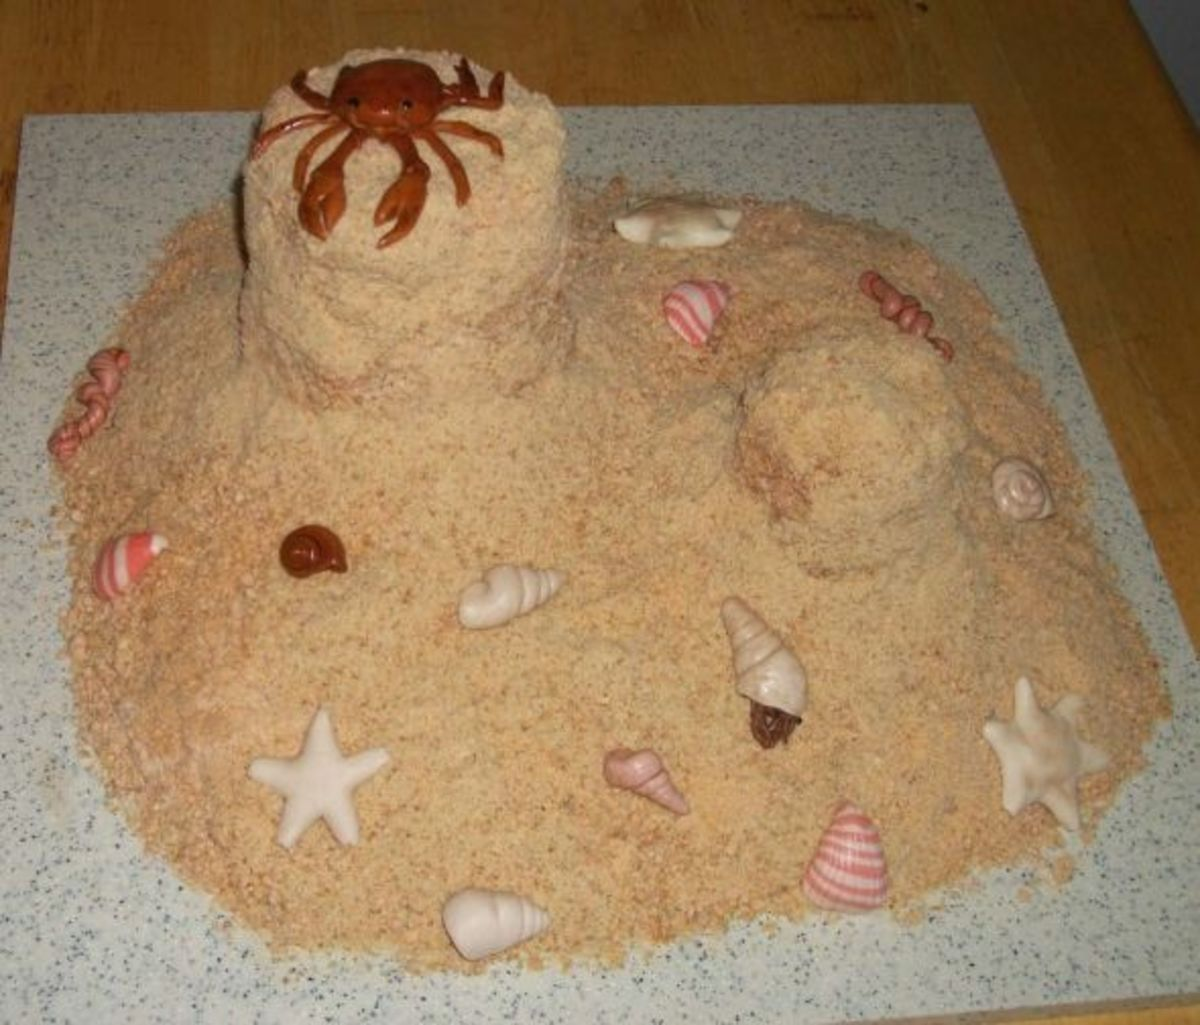 Sandcastle beach cake with hermit crabs, starfish, and seashells